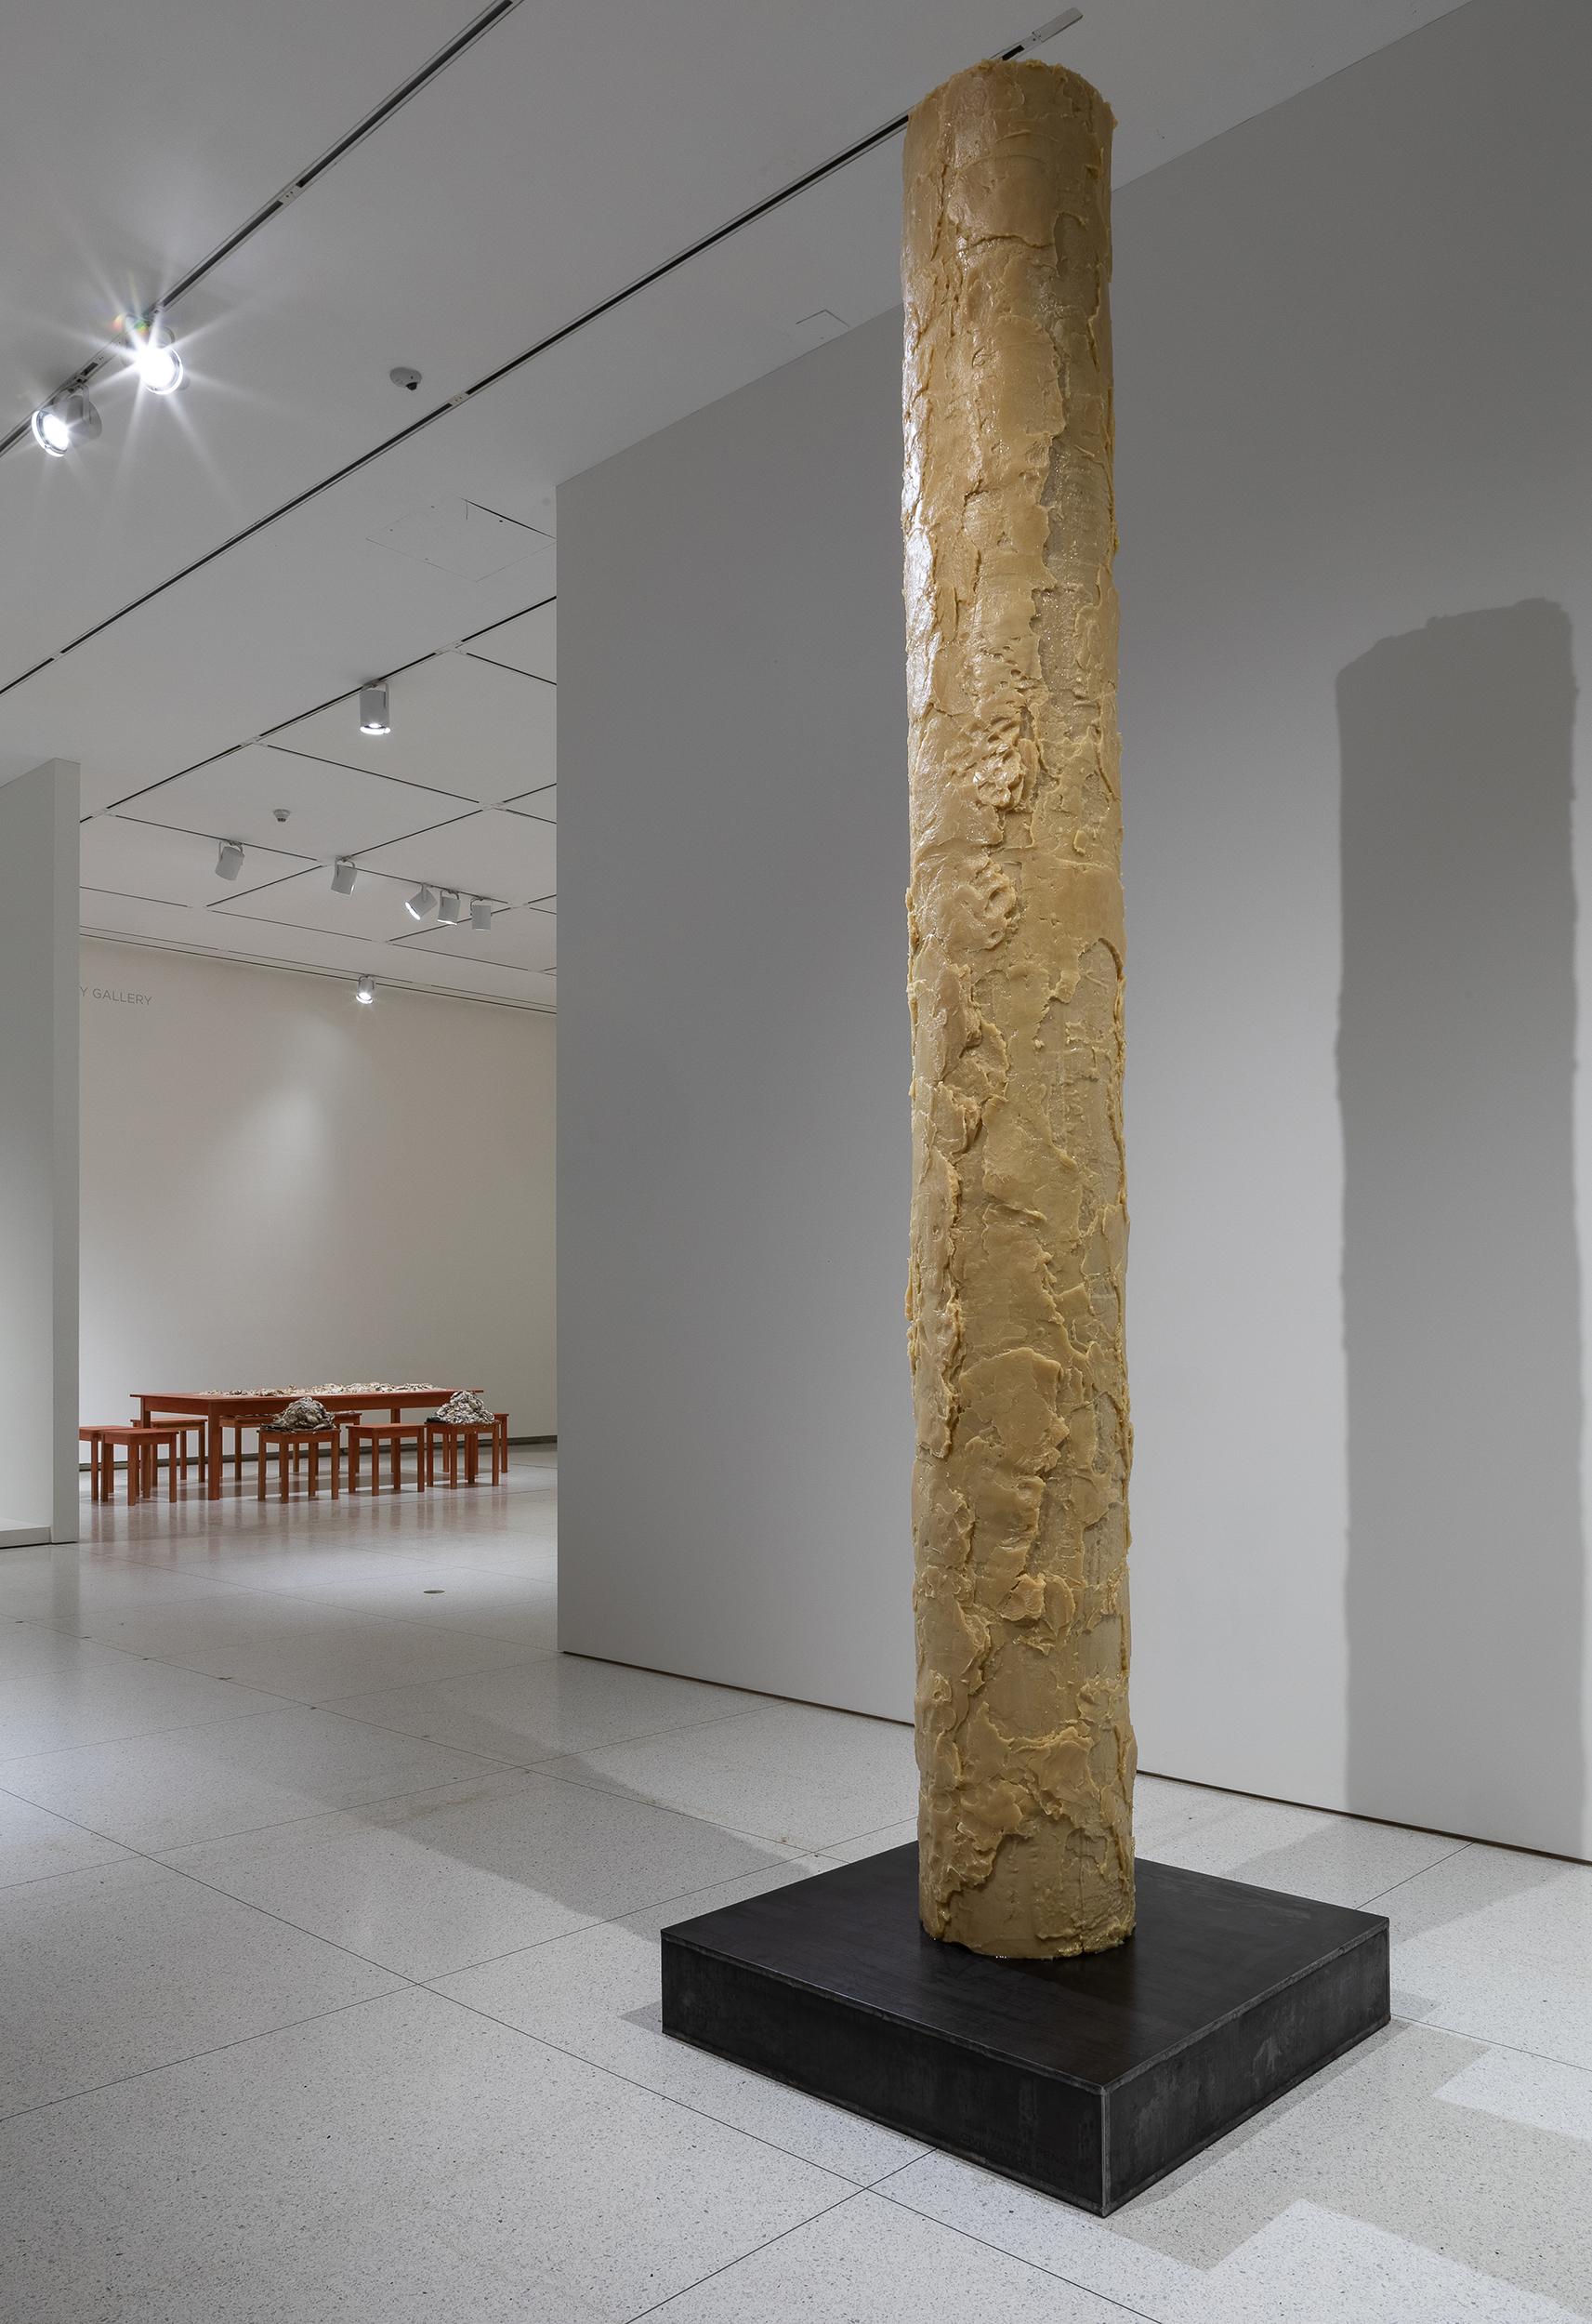 Sun Yuan and Peng Yu, Civilization Pillar, 2001/2019